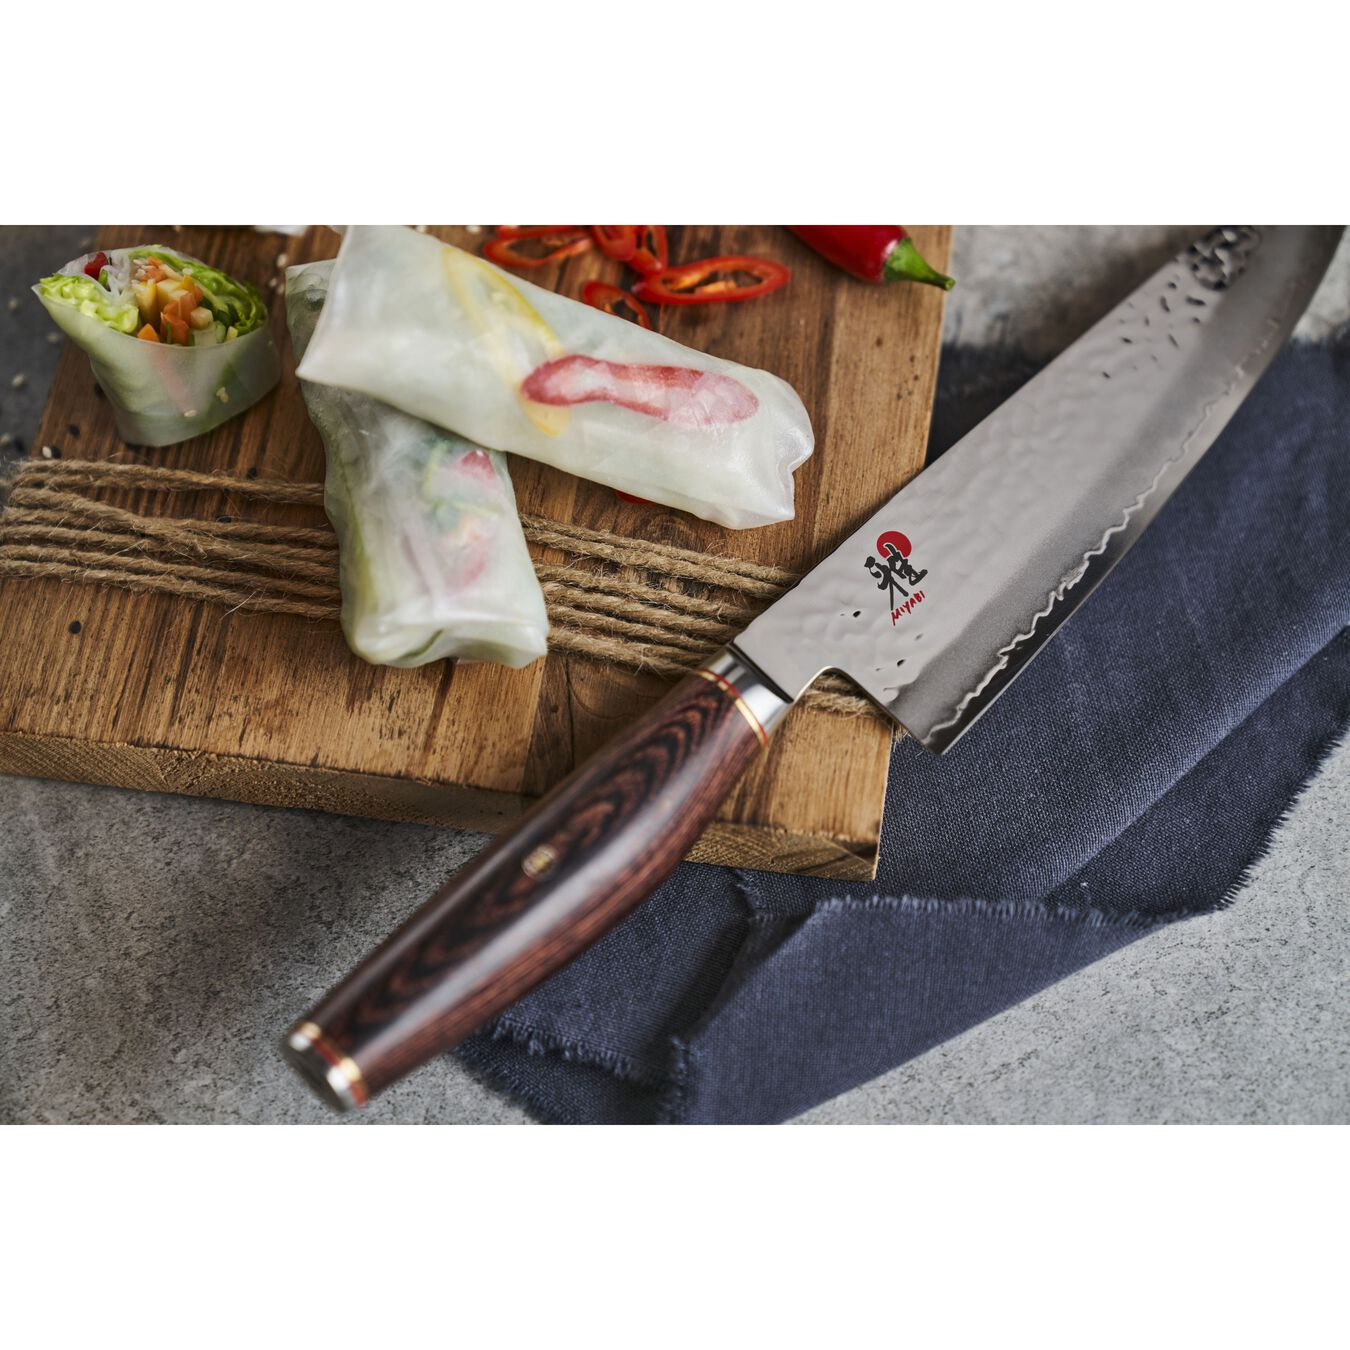 Gyutoh 20 cm, Braun, Pakka Holz,,large 3